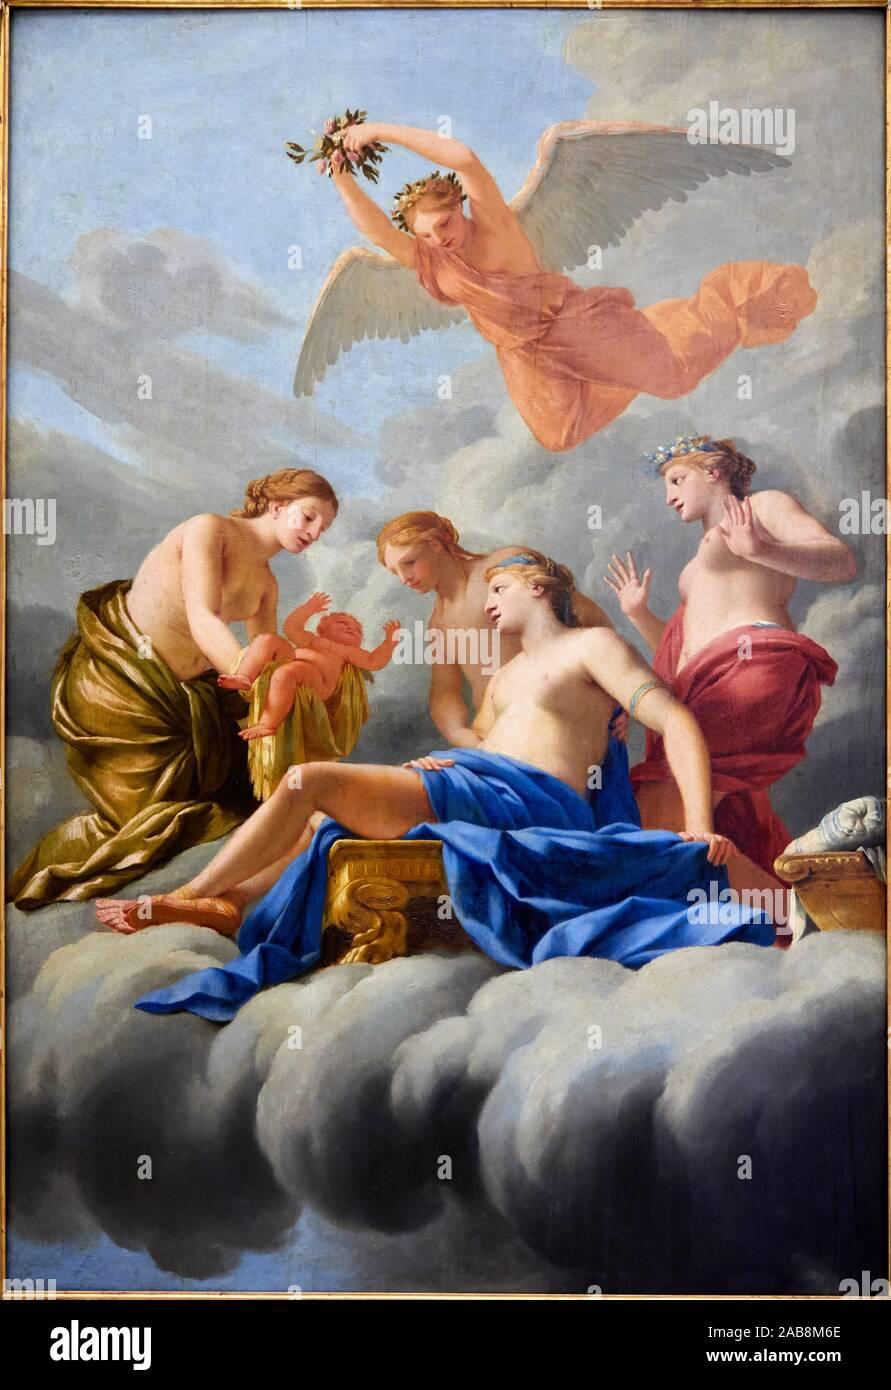 "'''La nascita di Cupido"", 1646-1647, Eustache Le Sueur, il Musée du Louvre, Parigi, Francia, Europa Foto Stock"